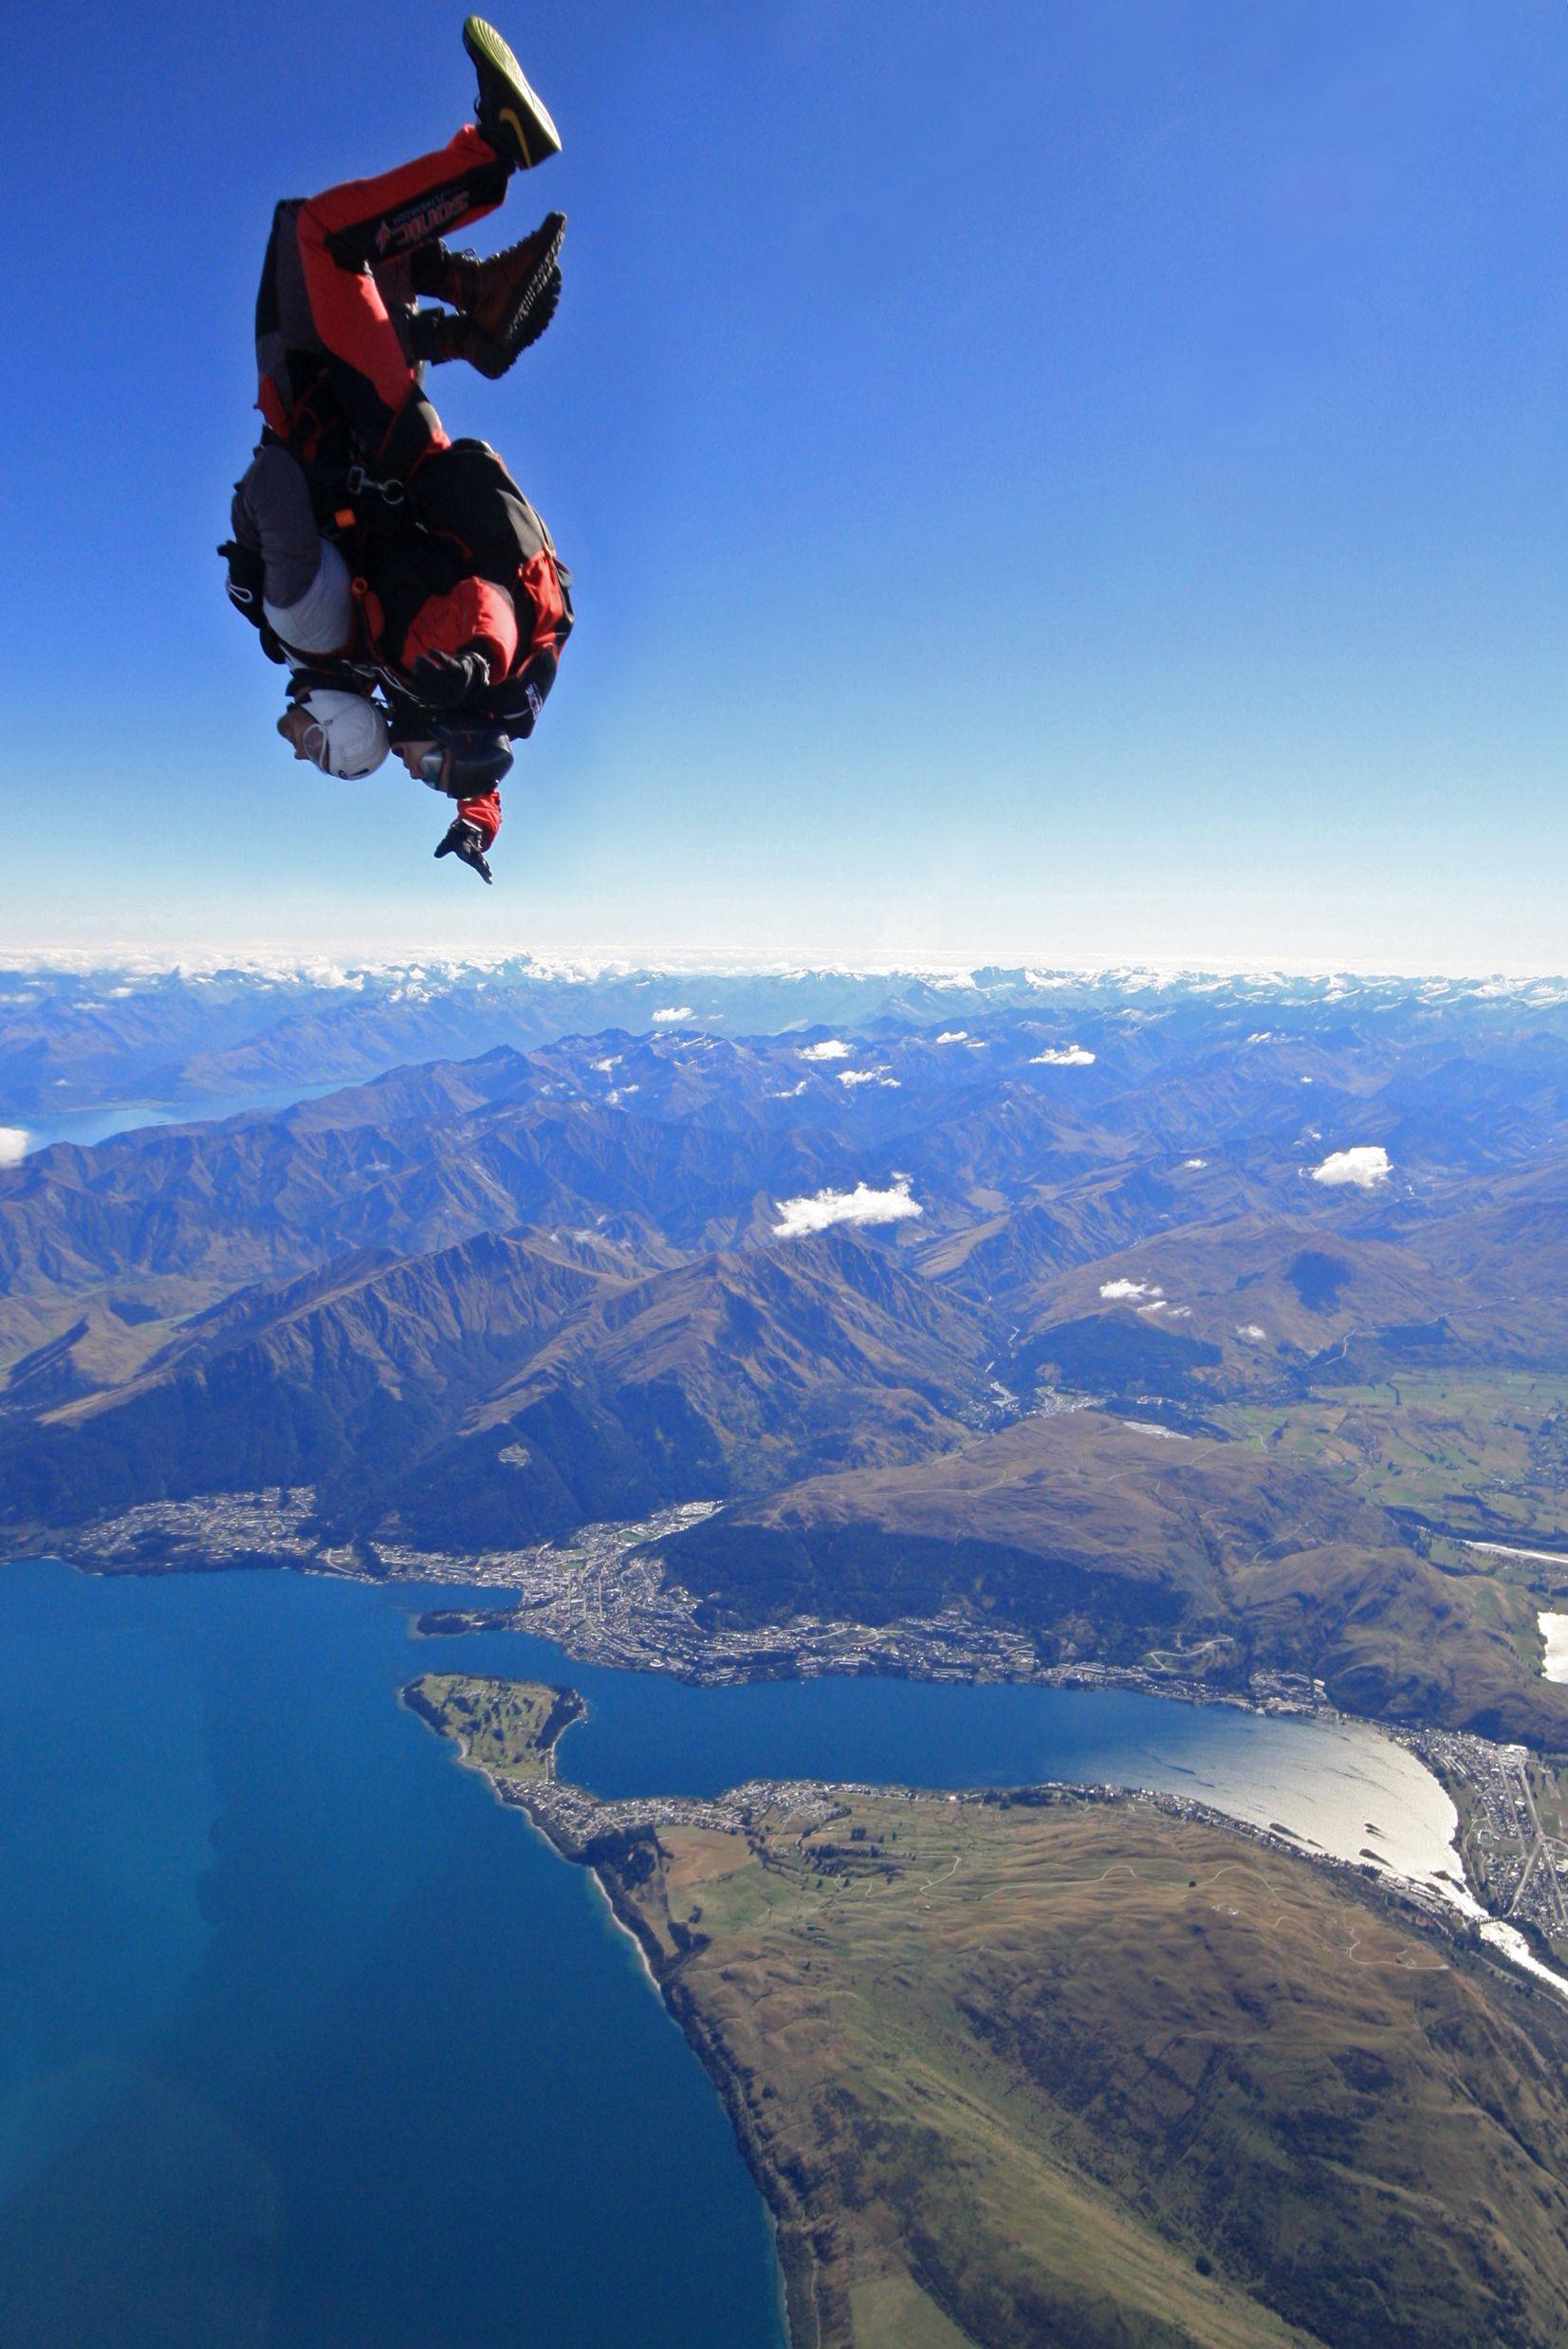 Skydiving Over Stunning Queenstown Scenery Queenstown Skydiving Travel Fun Dream Honeymoon